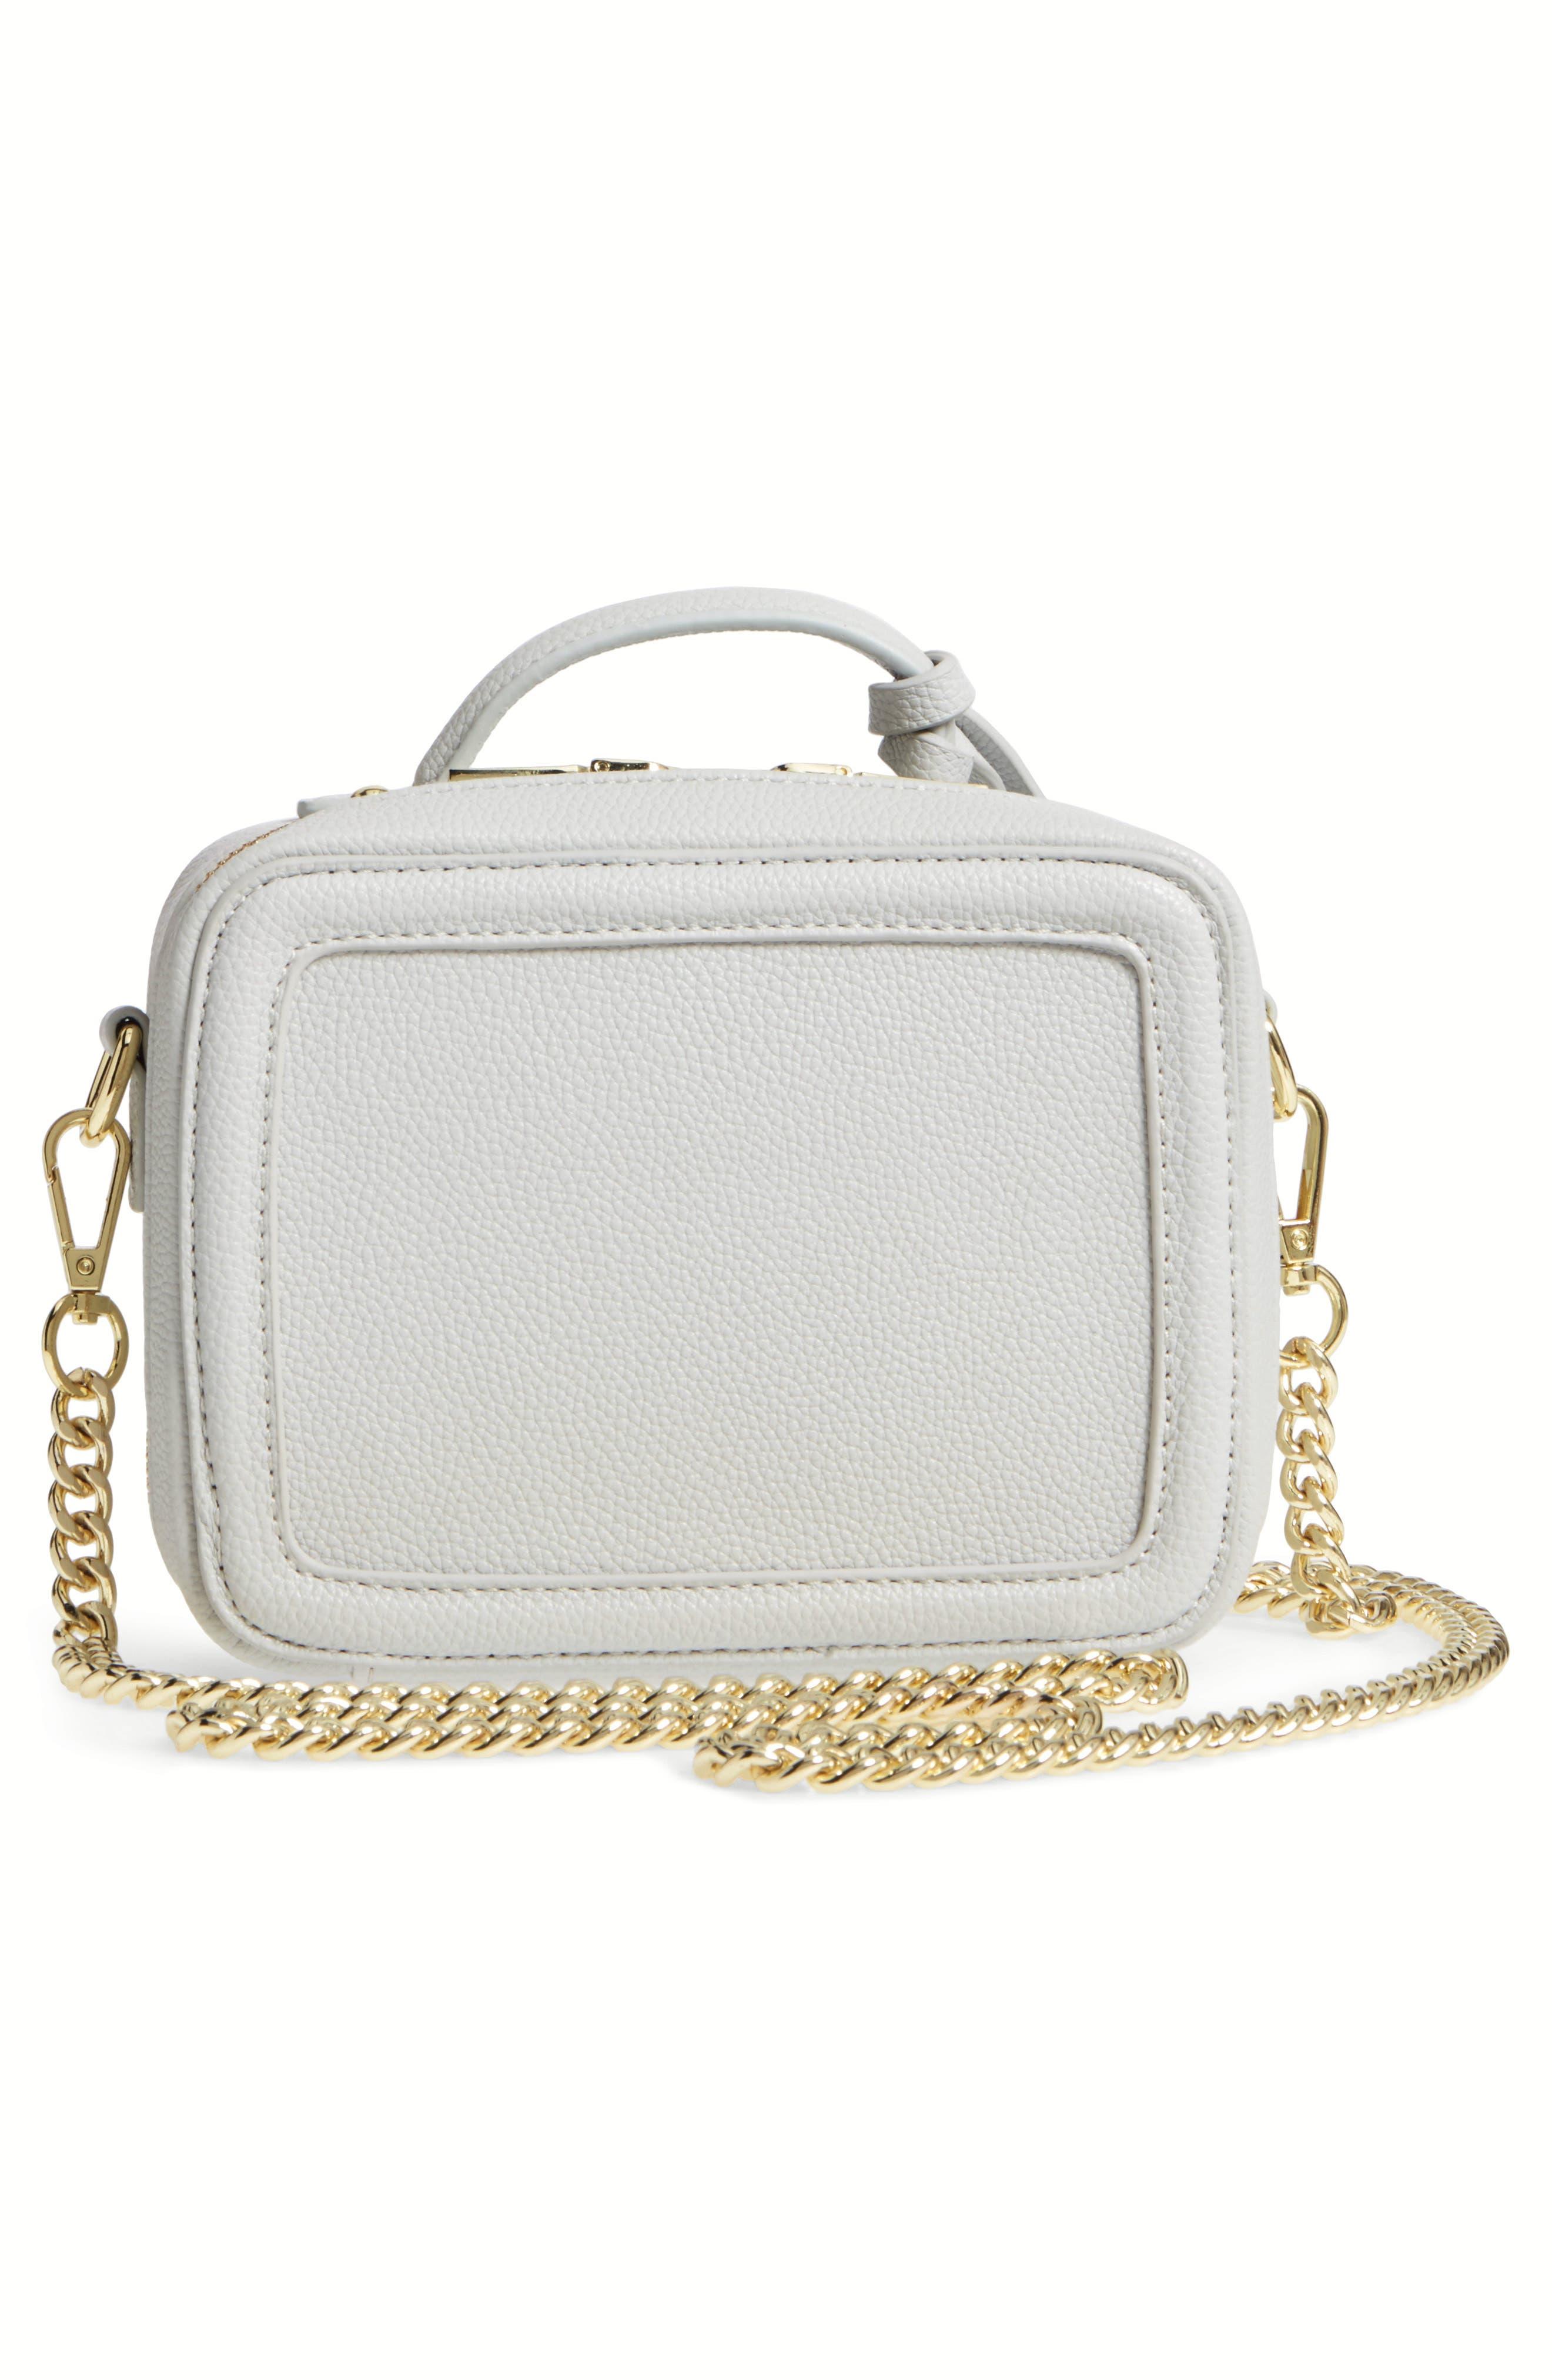 Taylor Faux Leather Crossbody Bag,                             Alternate thumbnail 3, color,                             Light Grey